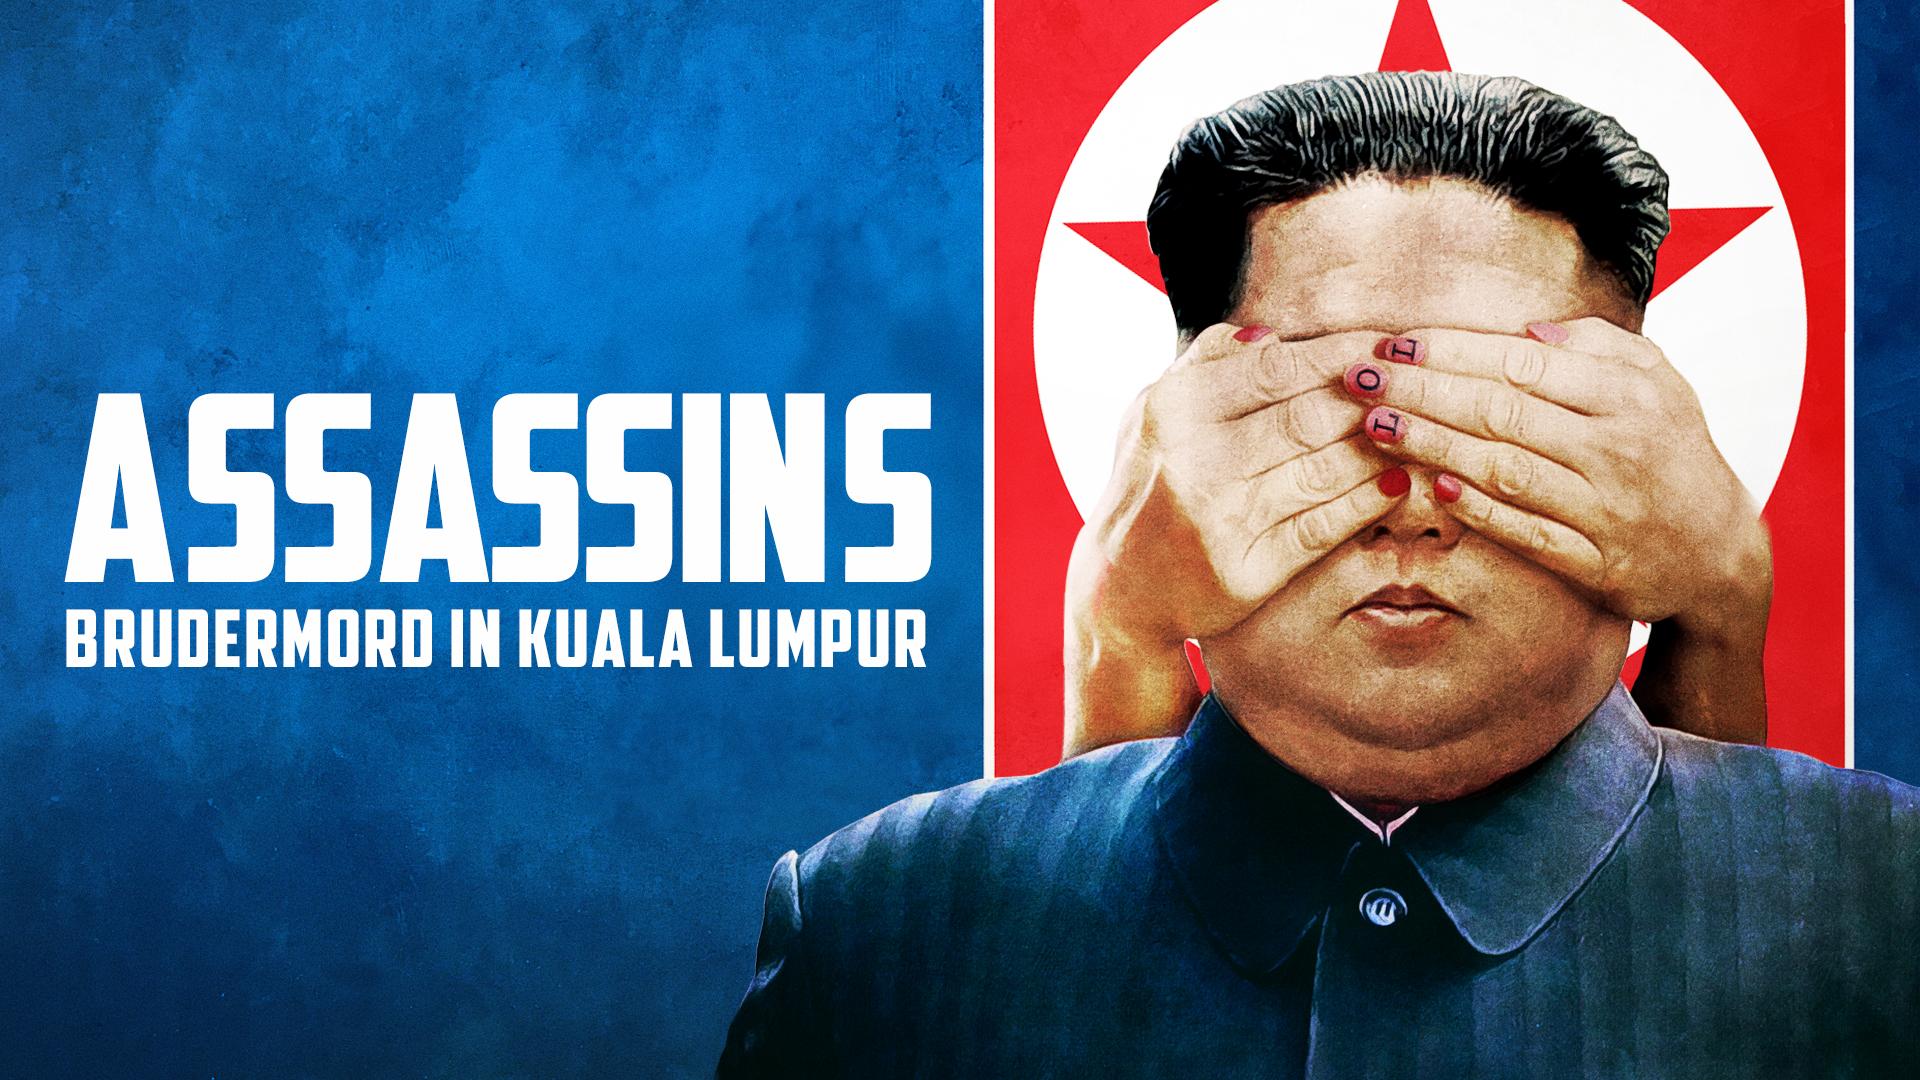 Assassins - Brudermord in Kuala Lumpur